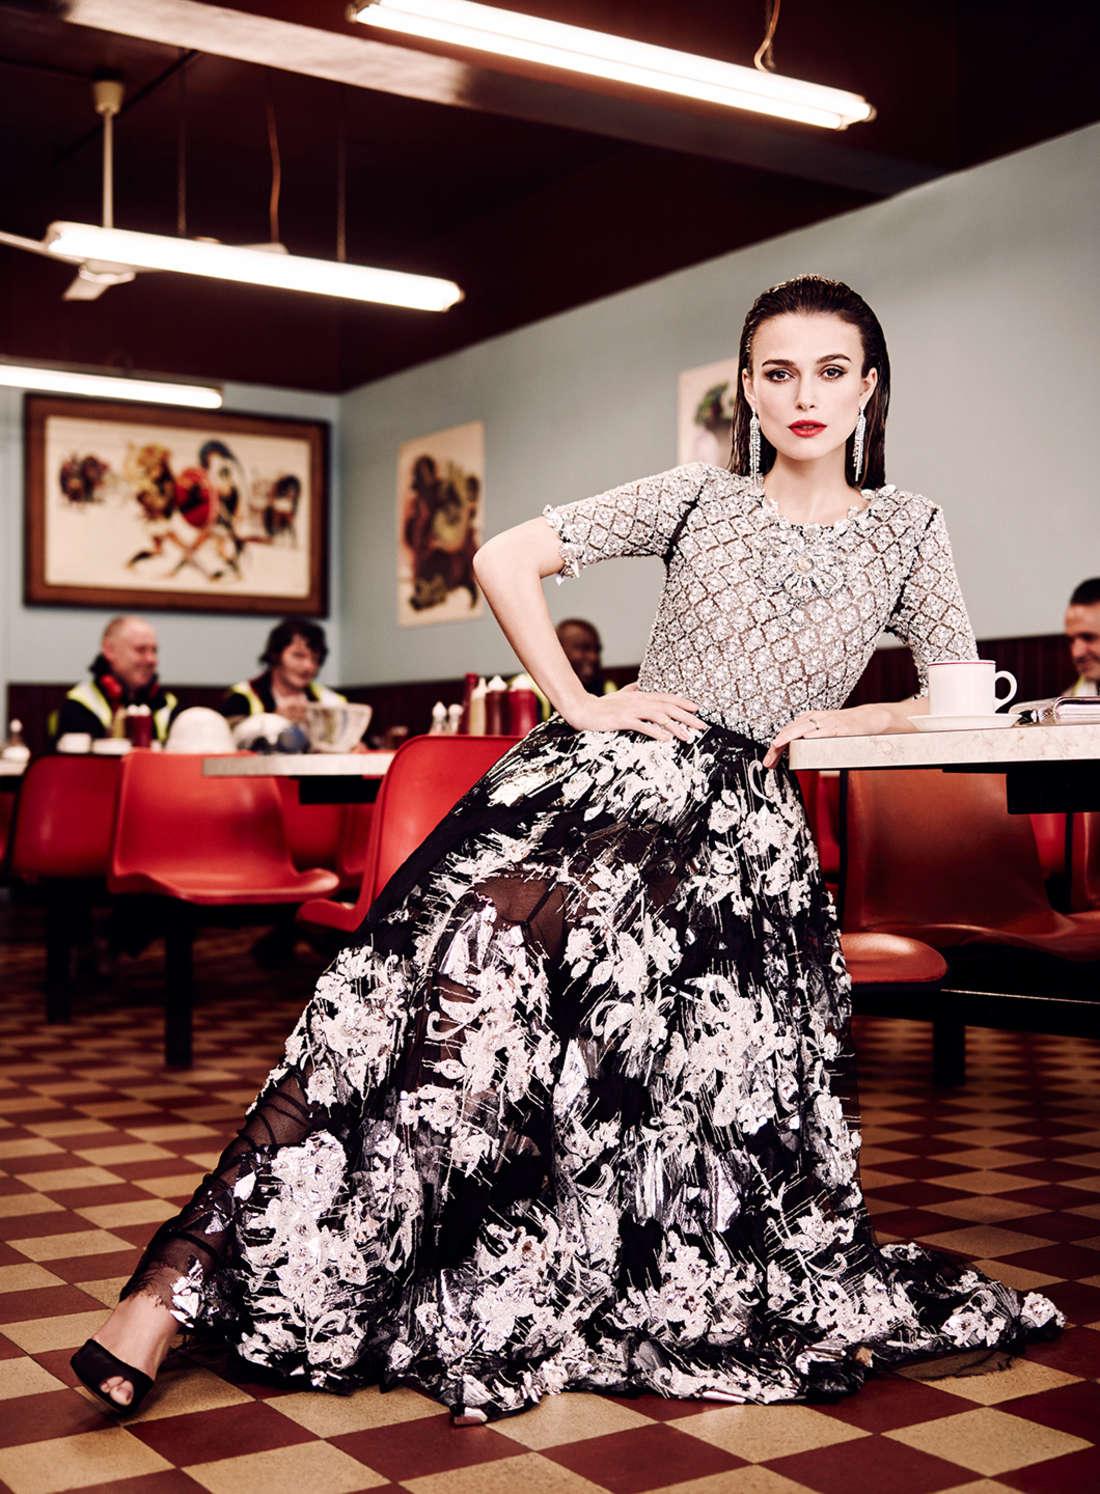 Keira Knightley Vanity Fair Us Photoshoot March 2015 Gotceleb